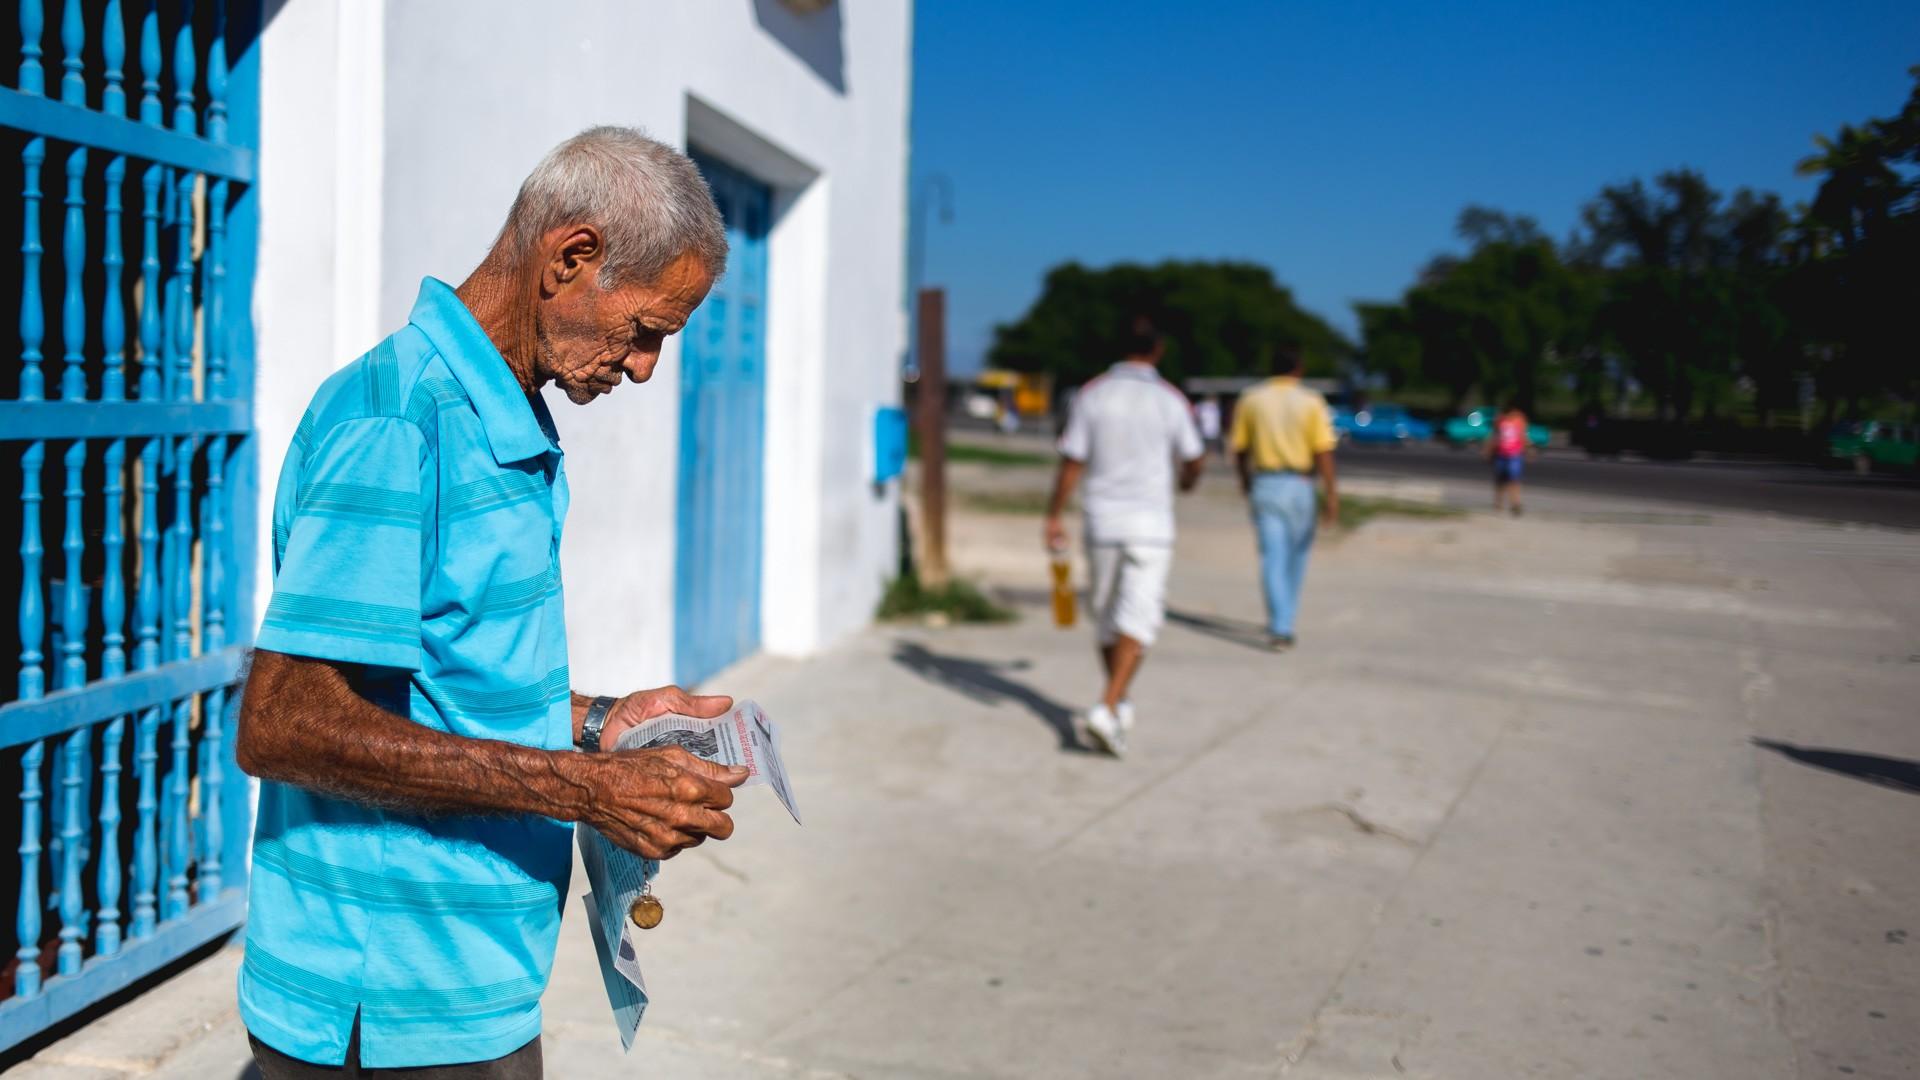 Damien-Dohmen-Photographe-Cuba-23